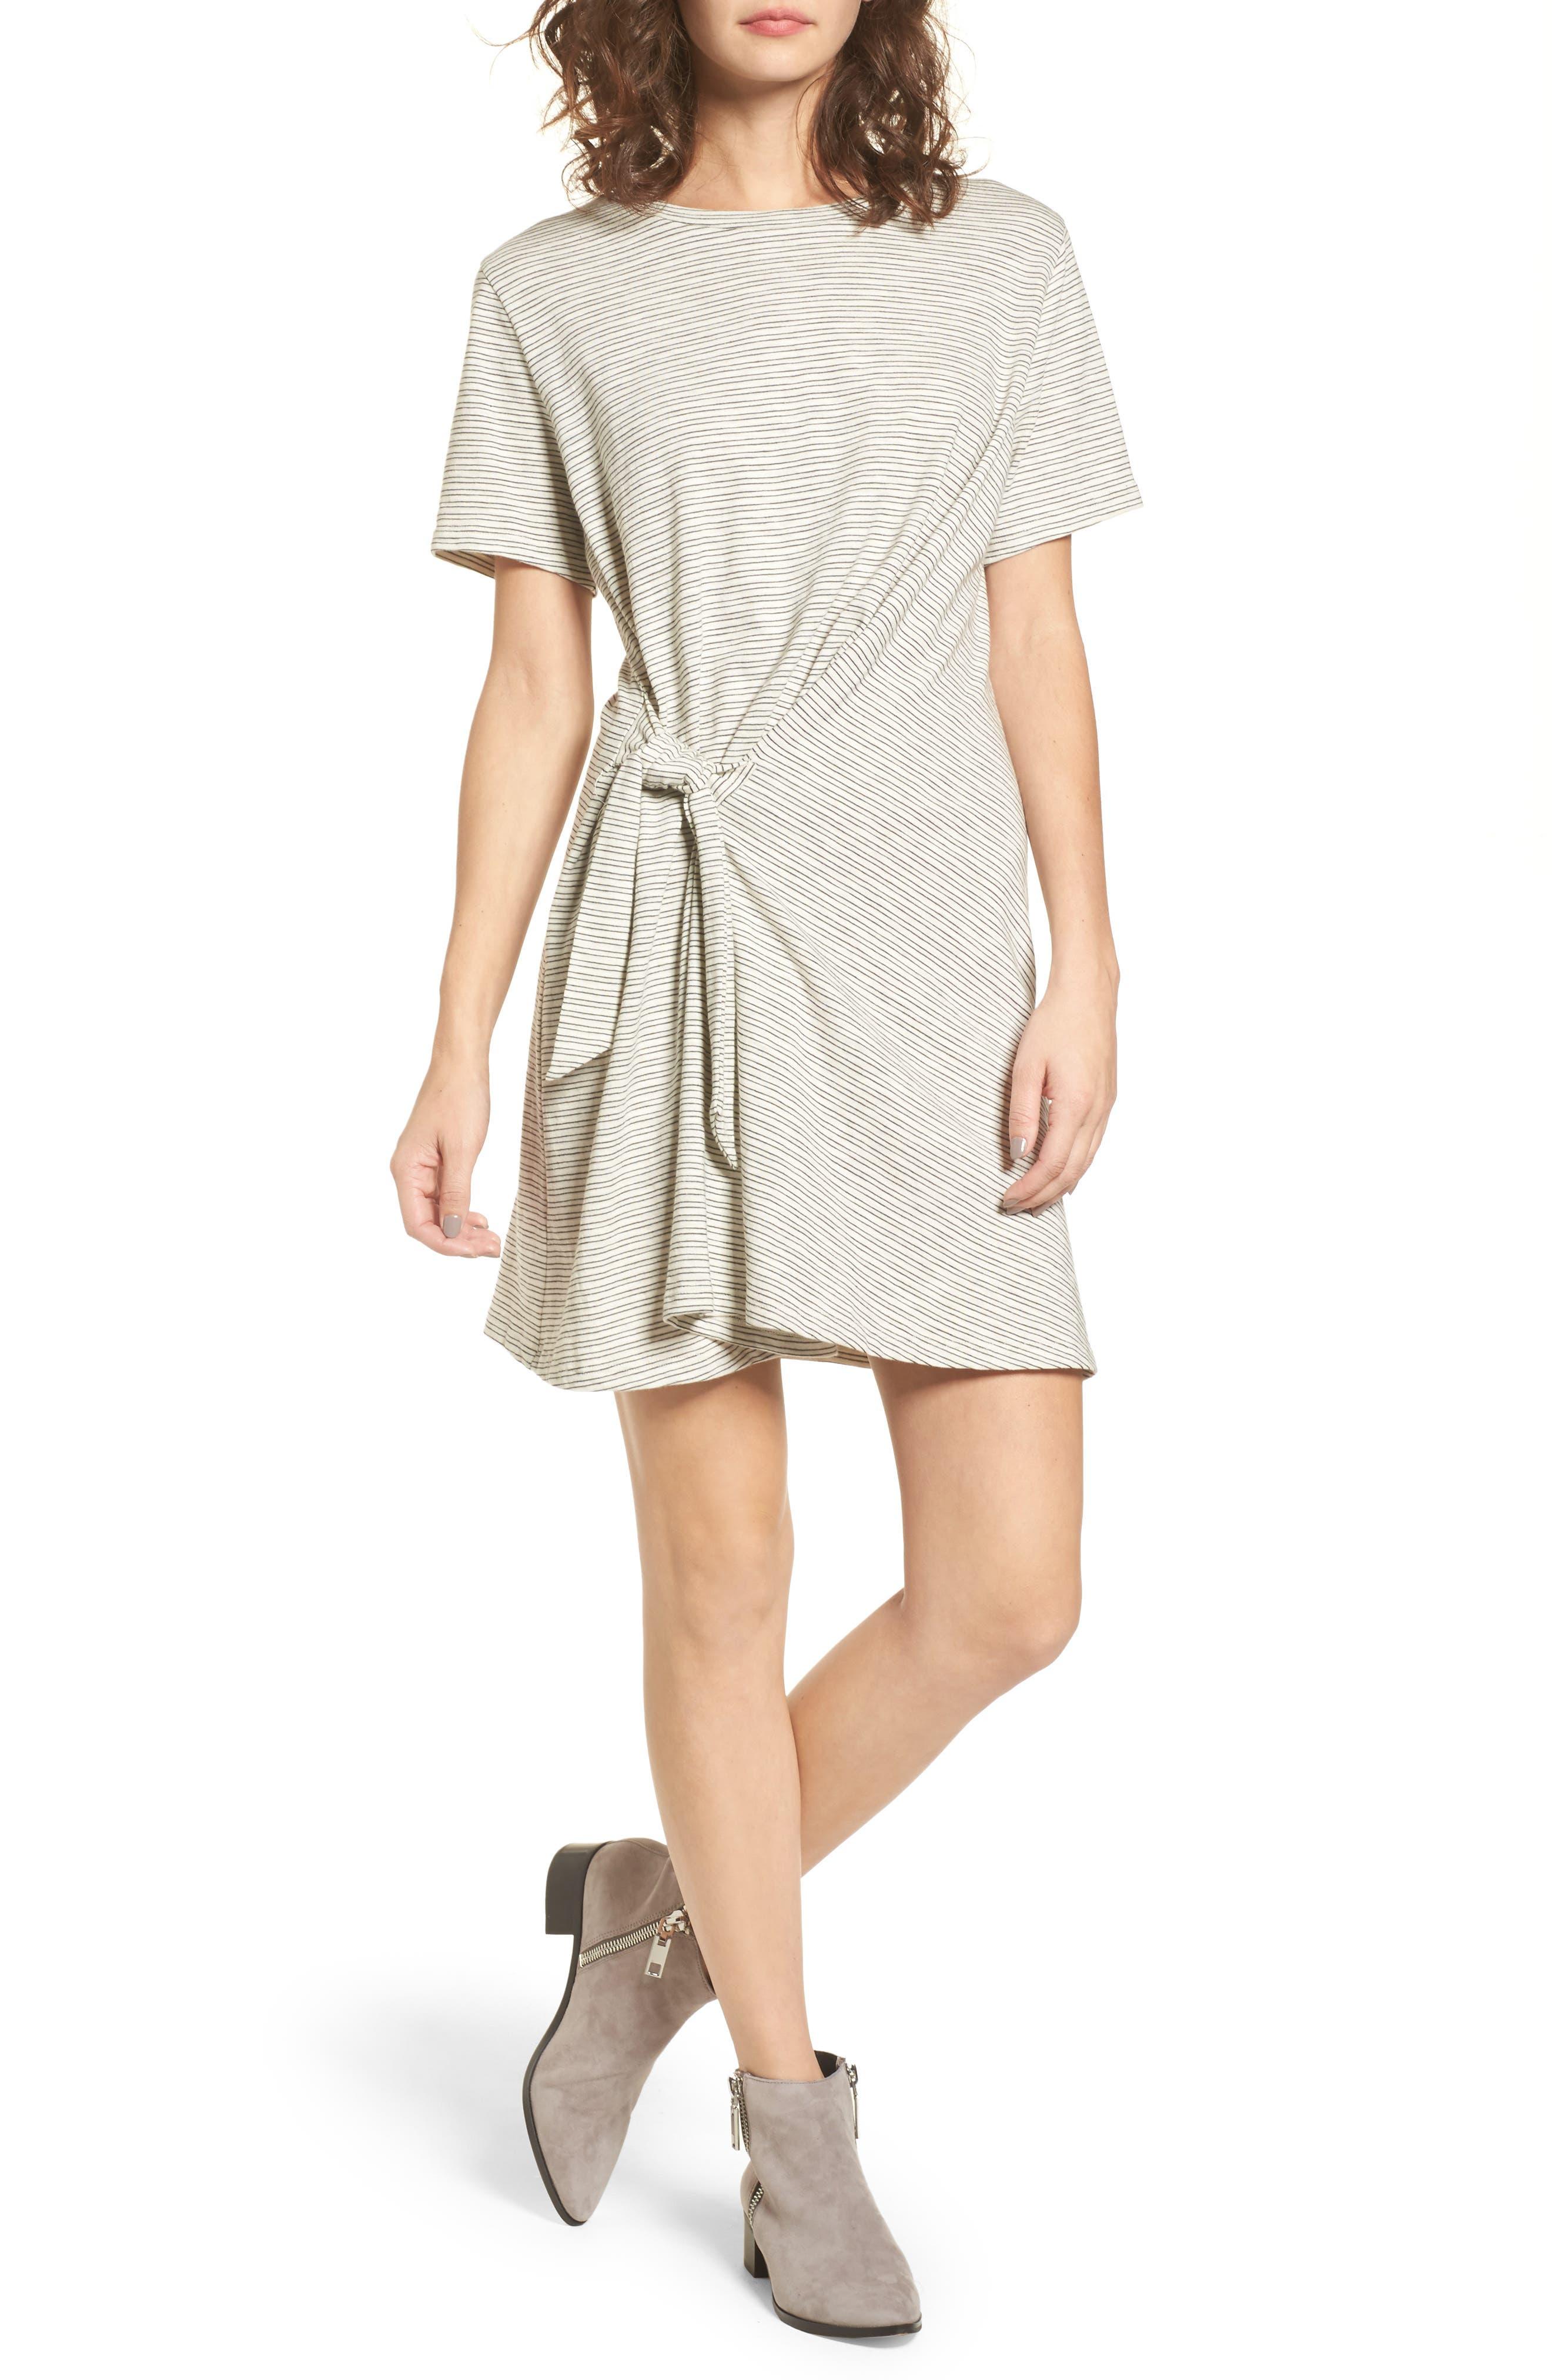 Alternate Image 1 Selected - Side Knot Tee Dress